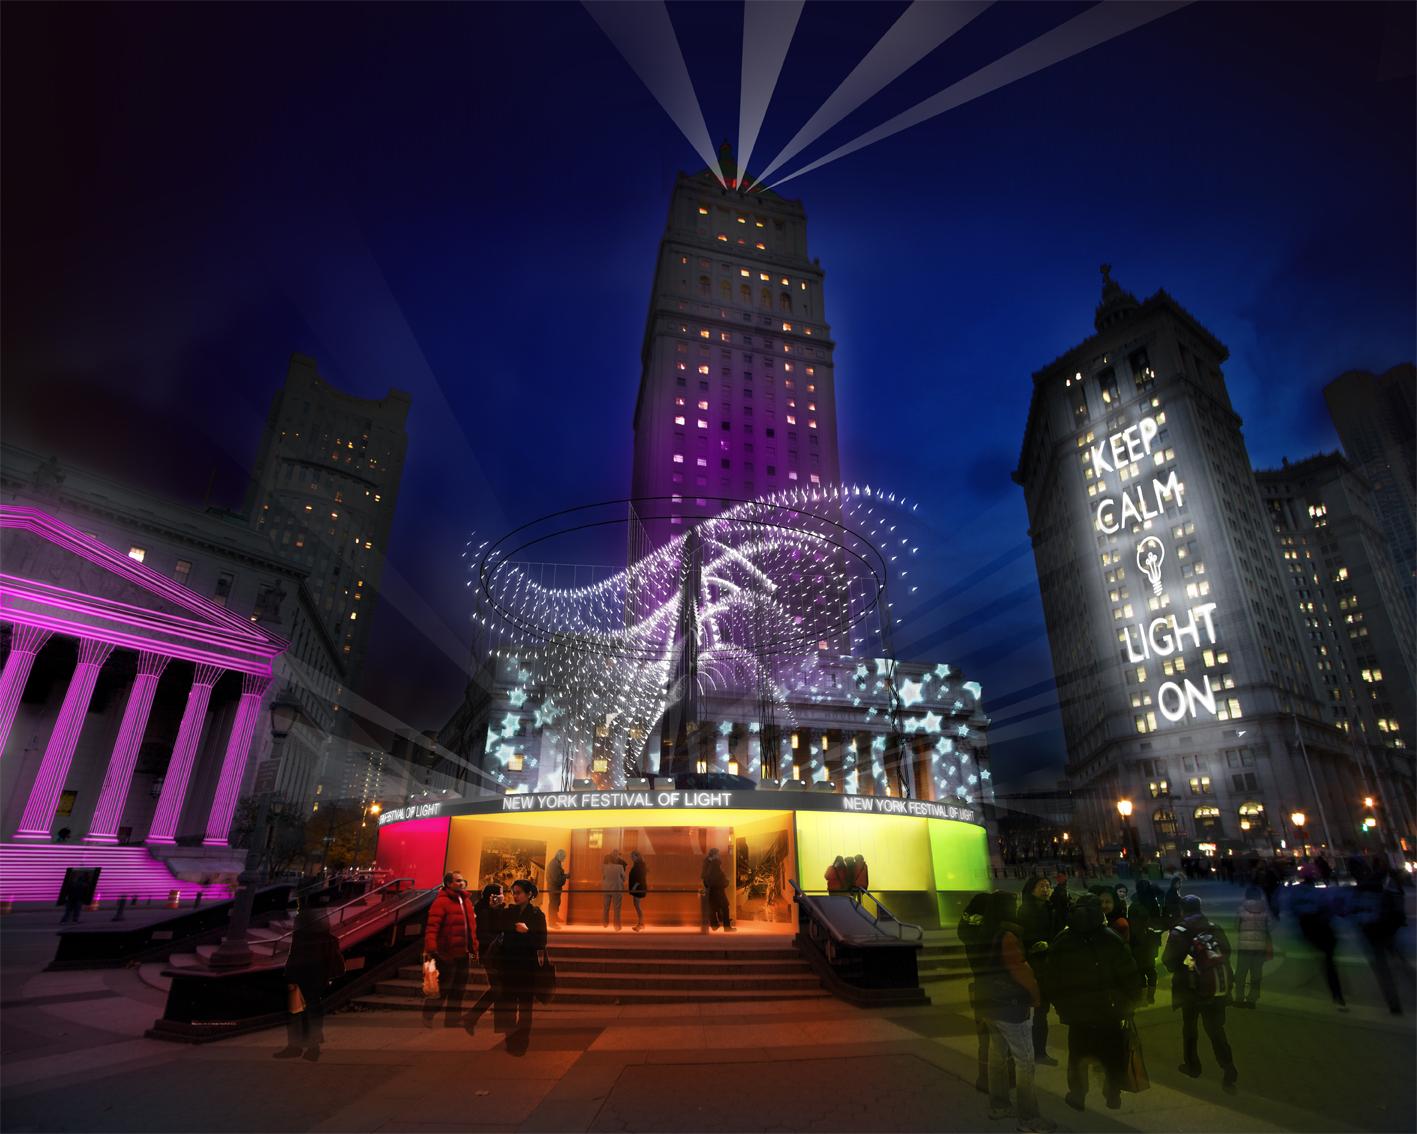 Tomorrow: the first ever new york festival of light alfalfa studio